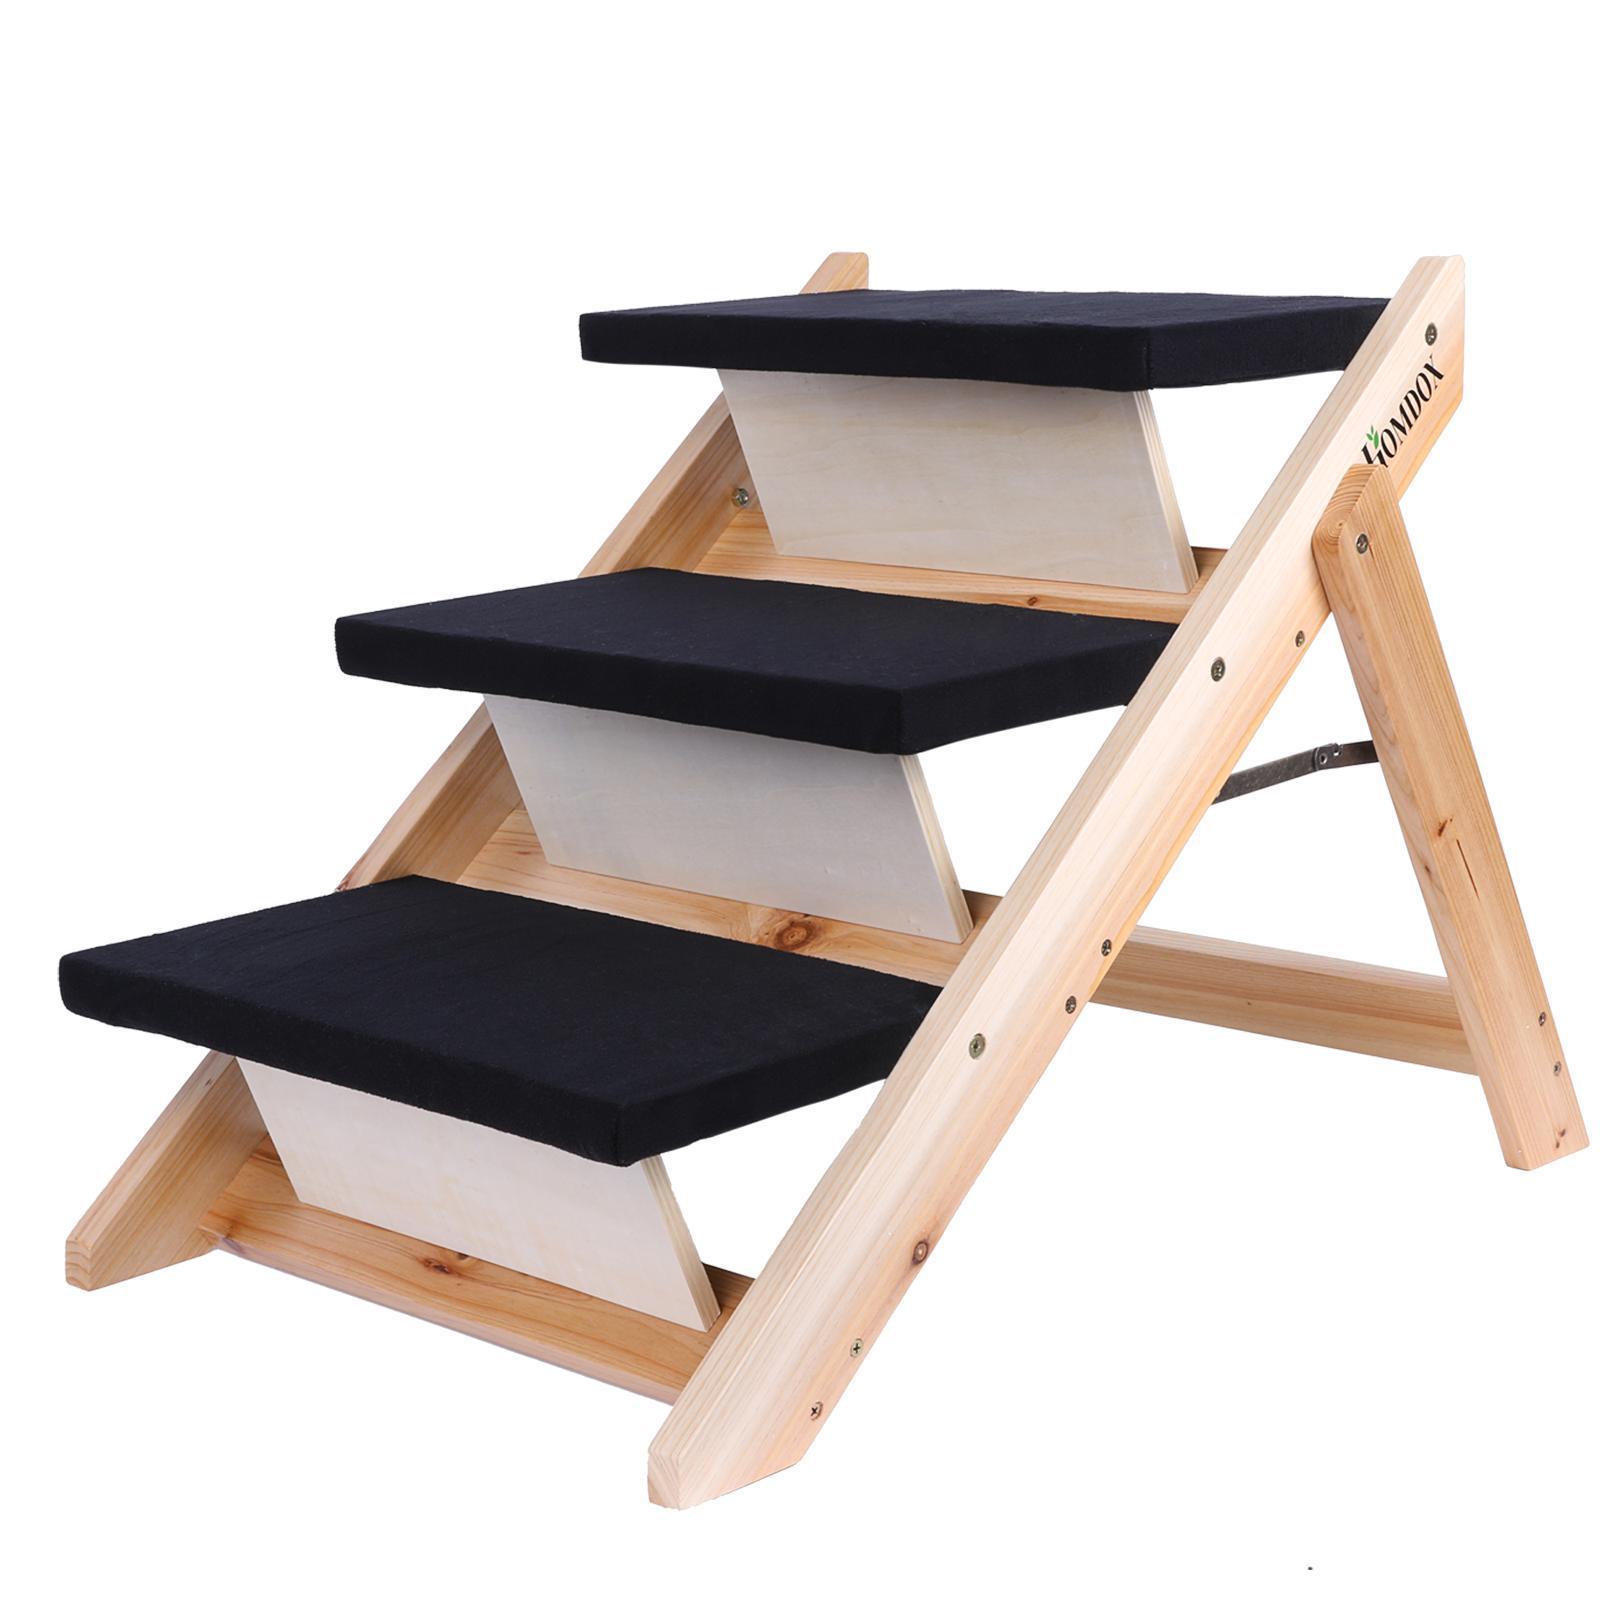 2016 Large Wooden Pet Ladder Stairs Dog Ramp Bed Steps Folding Portable Usa Ebay